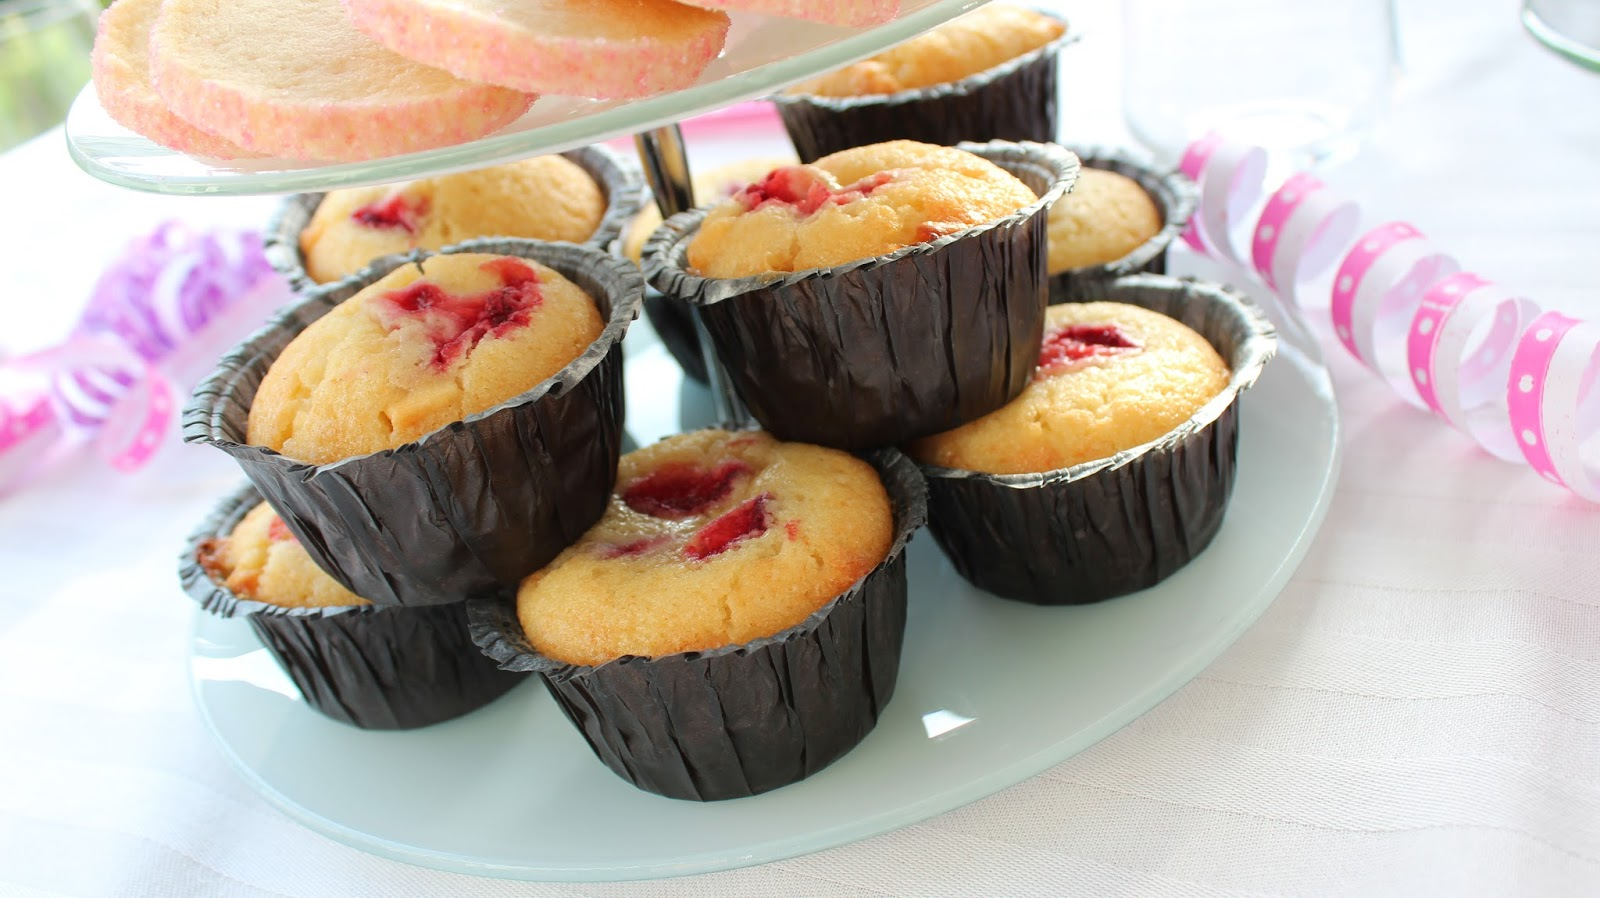 jordgubbsmuffins med choklad